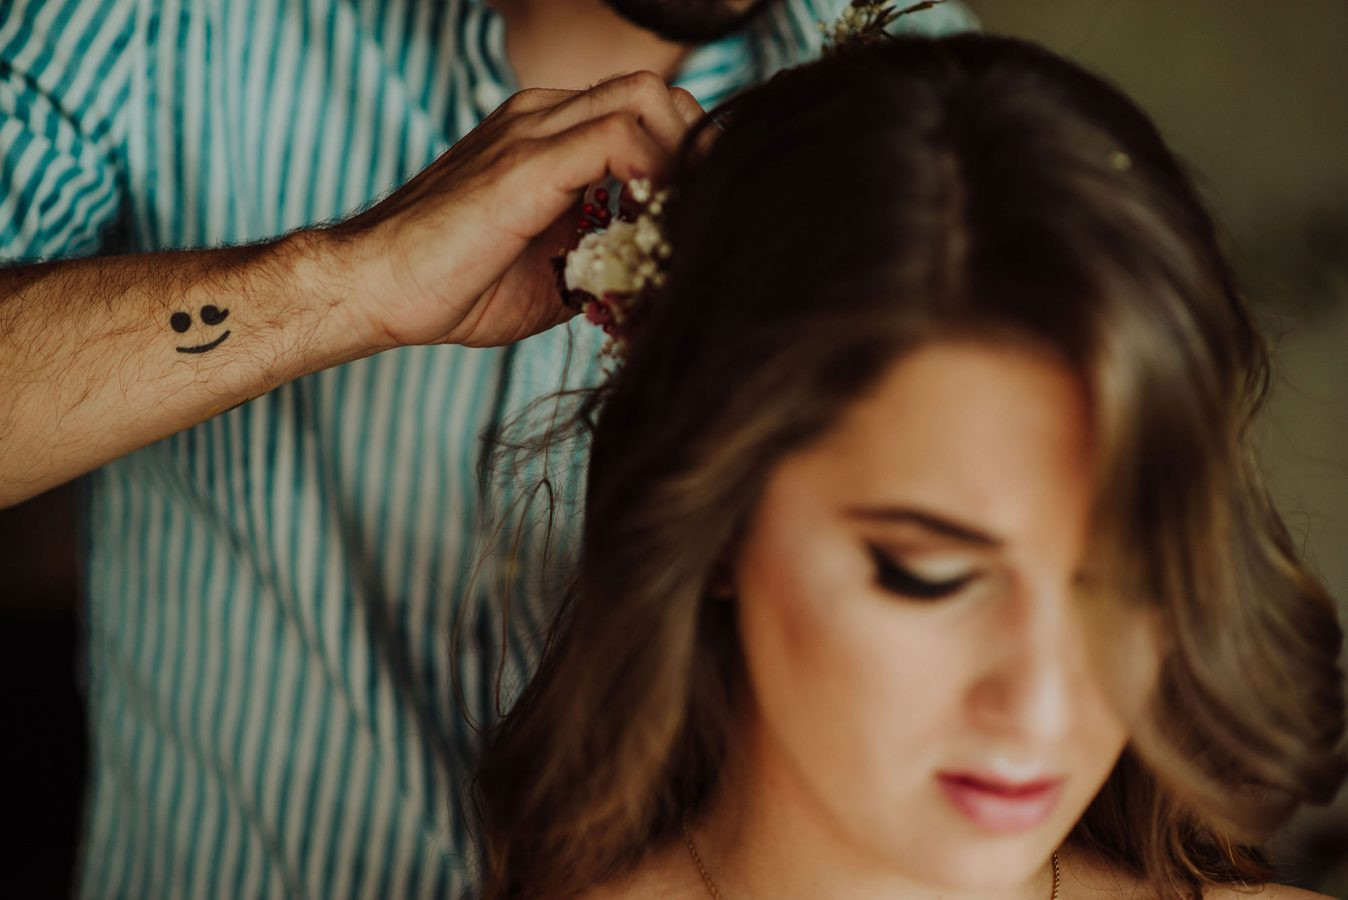 fotografos-de-boda-uruguay-4